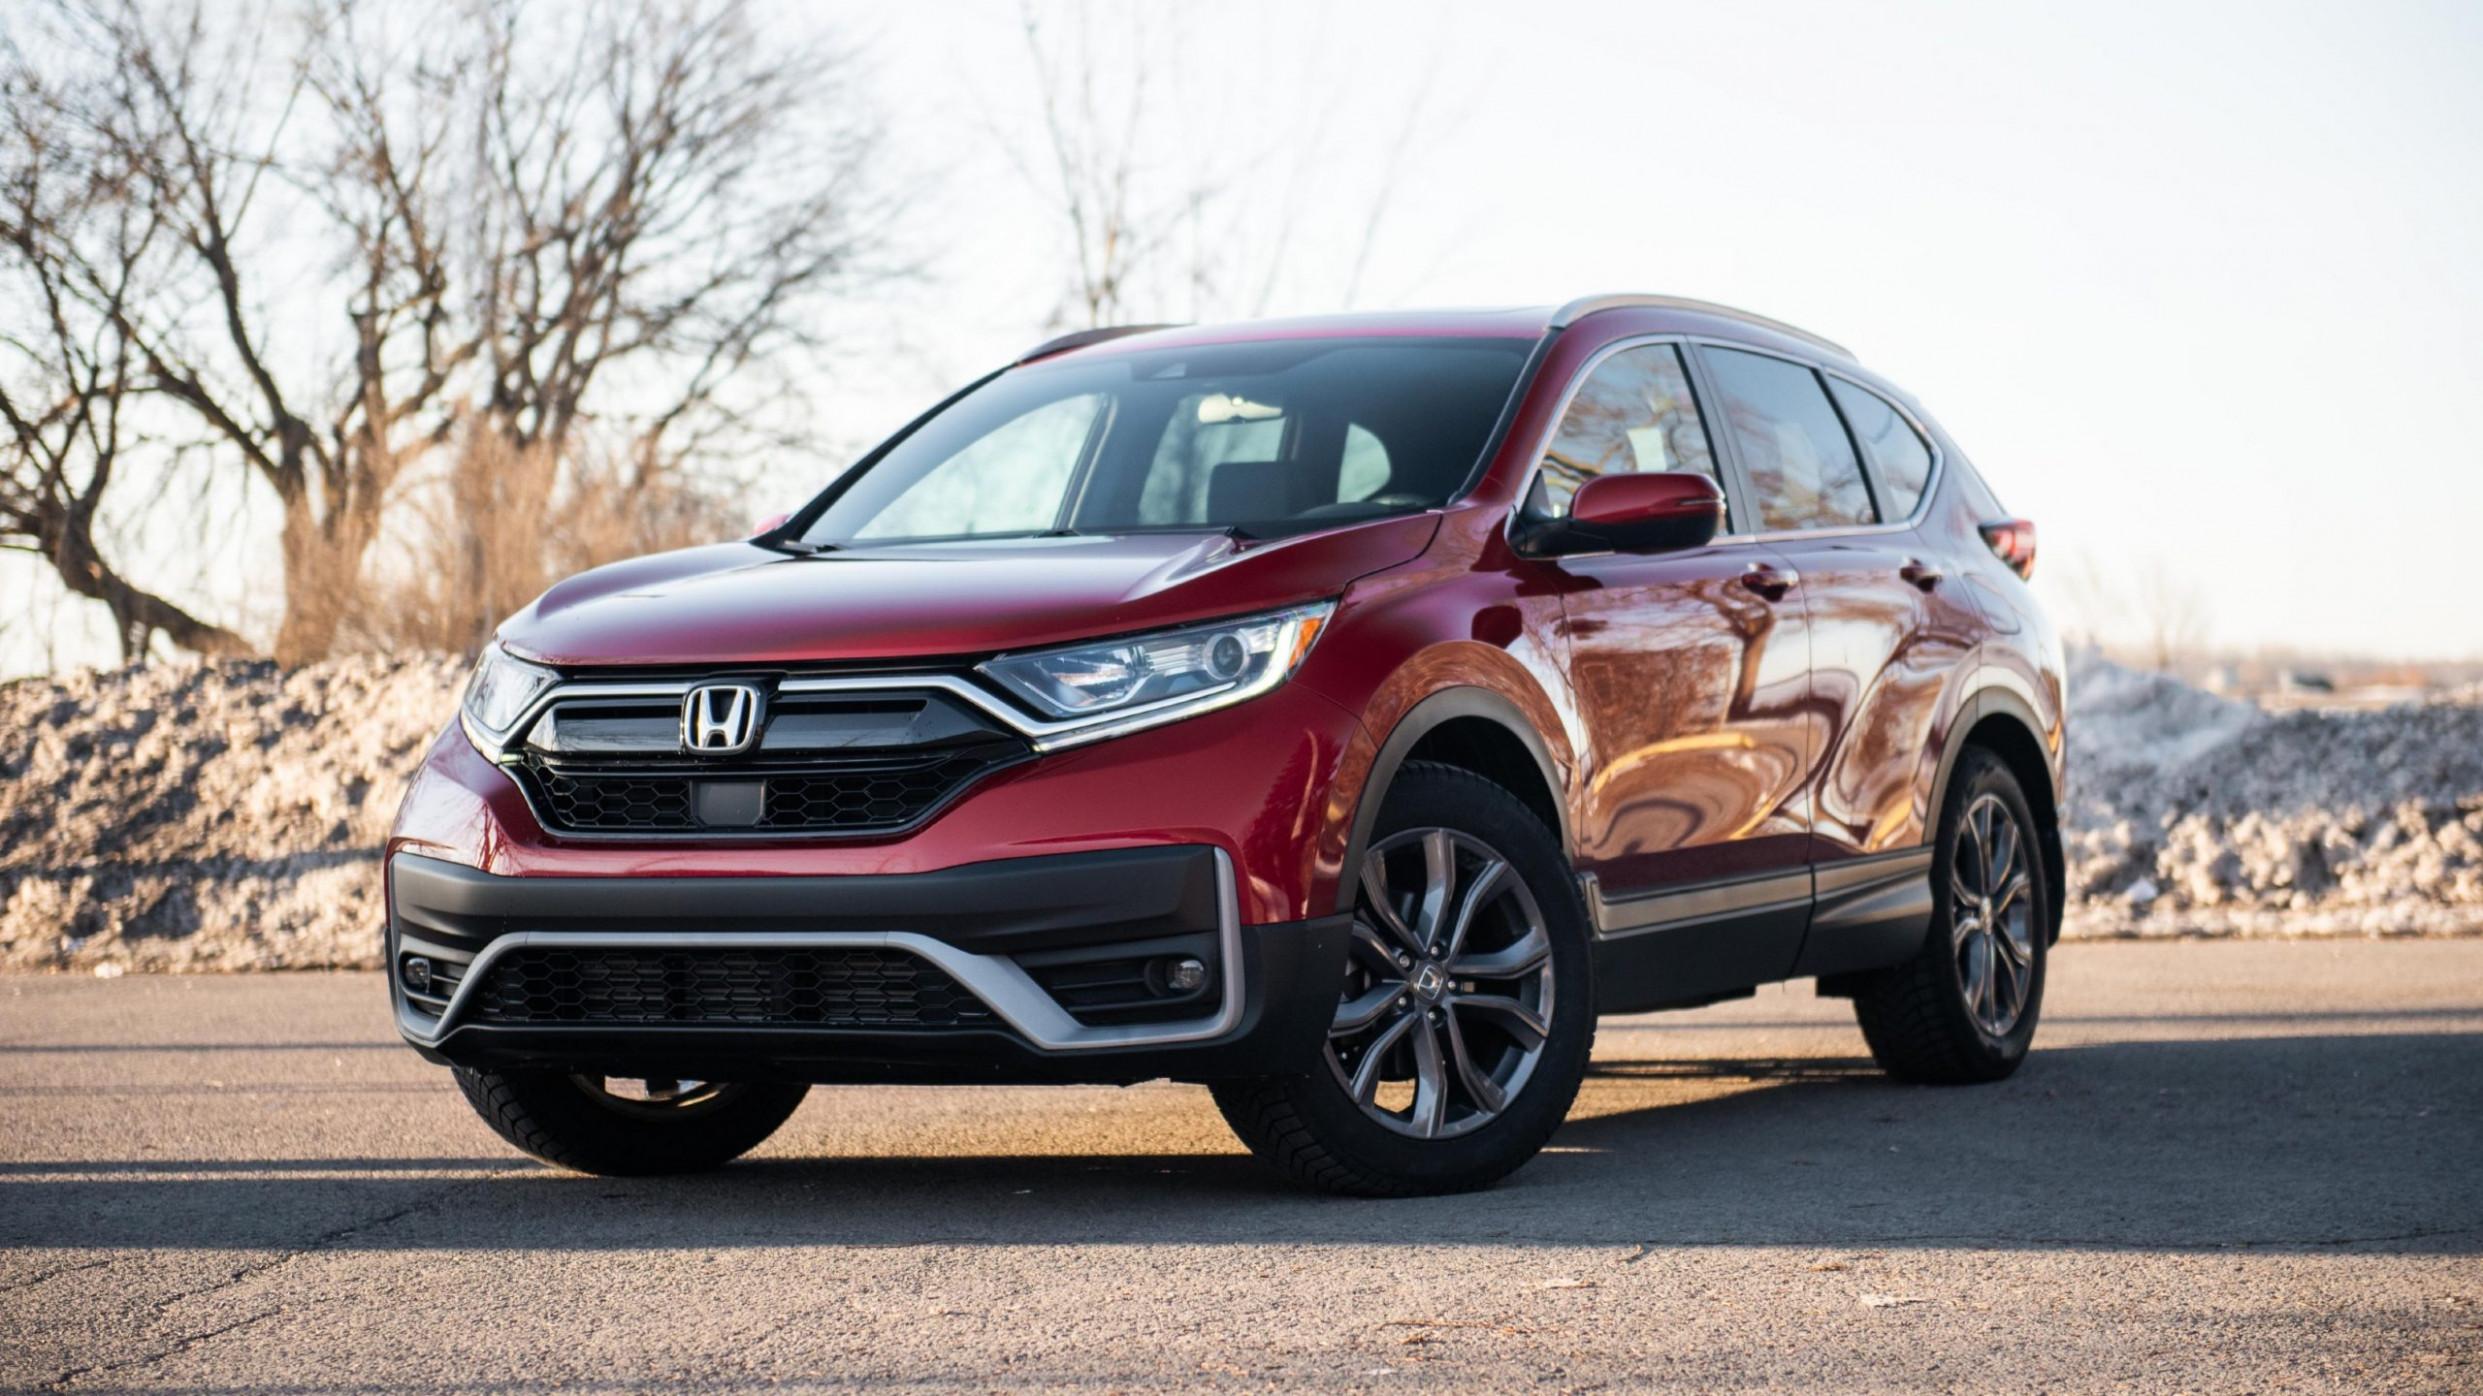 Photos Honda Crv 2022